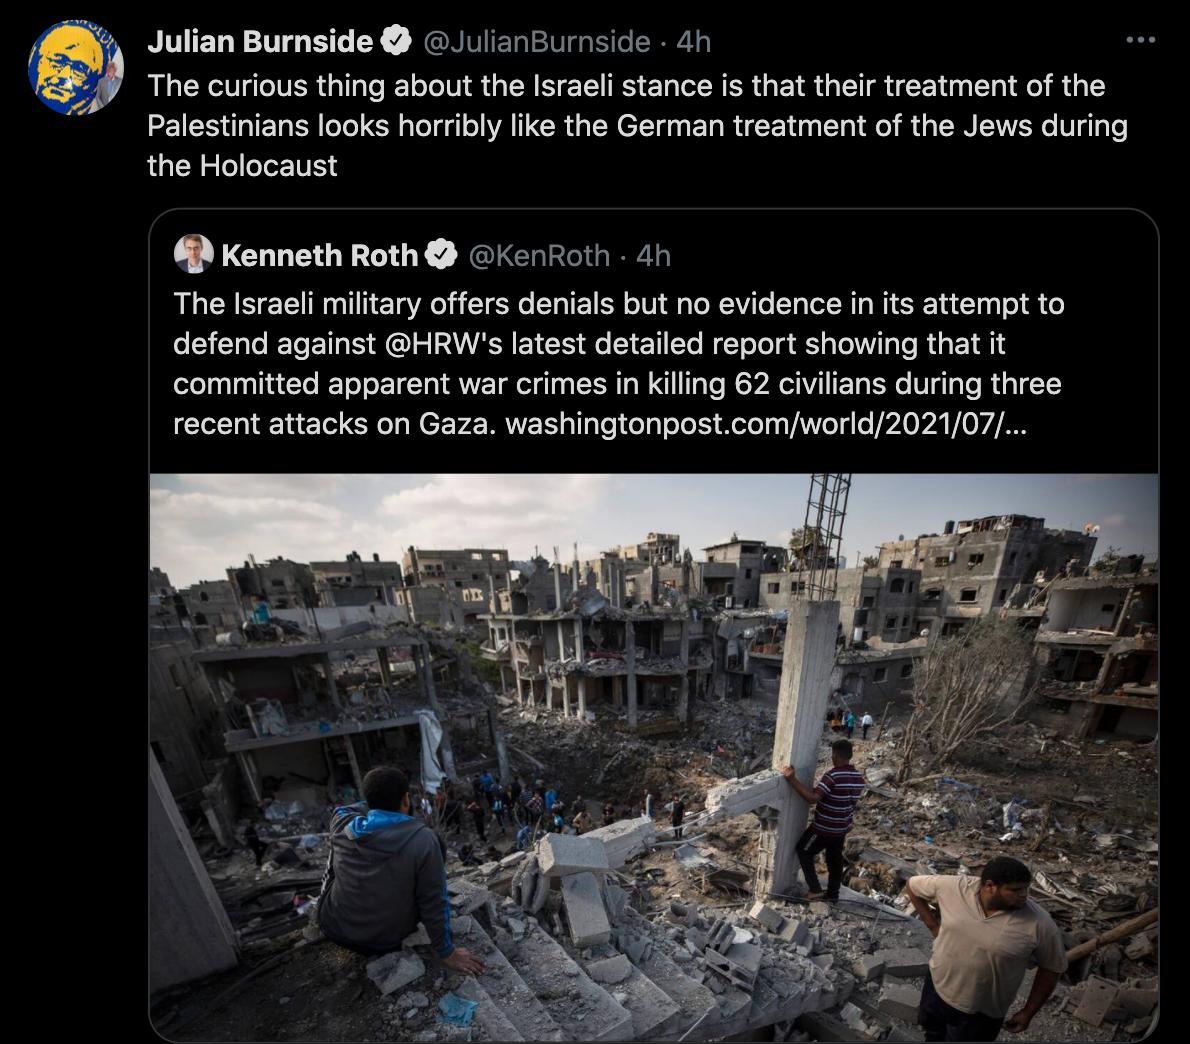 Burnside tweet slammed, apology rejected